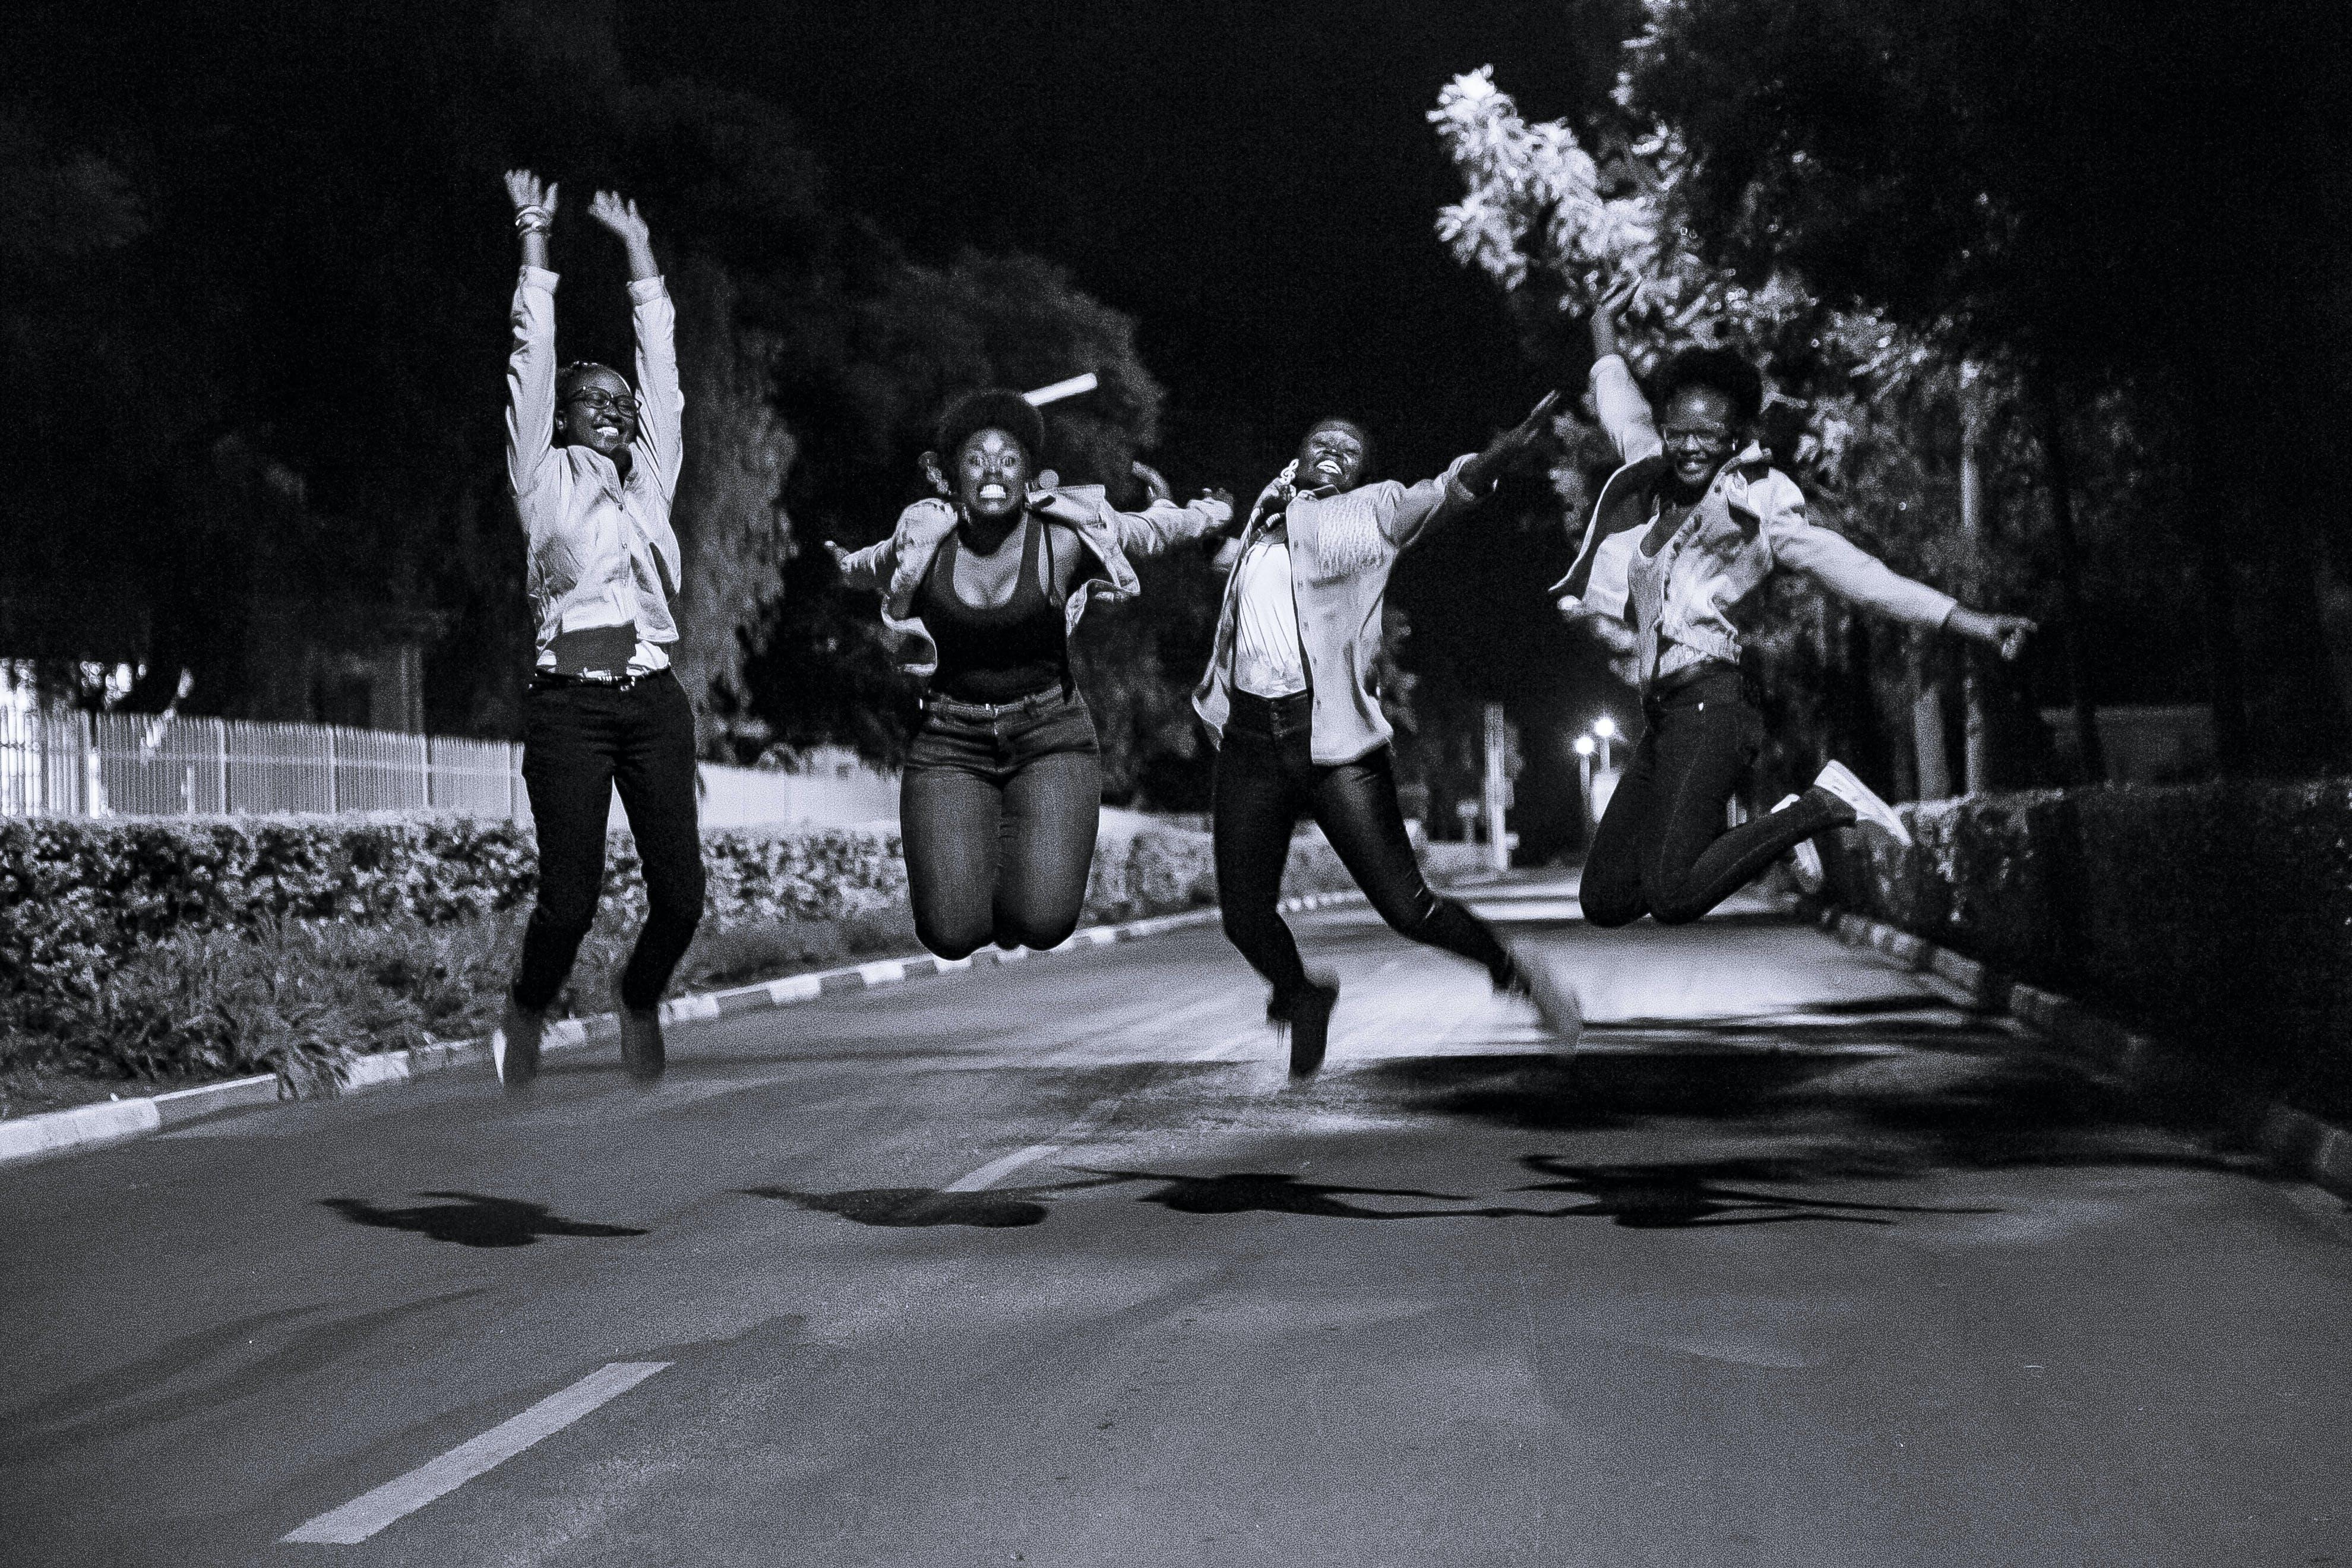 Group Of People Doing A Jump Shot \u00b7 Free Stock Photo